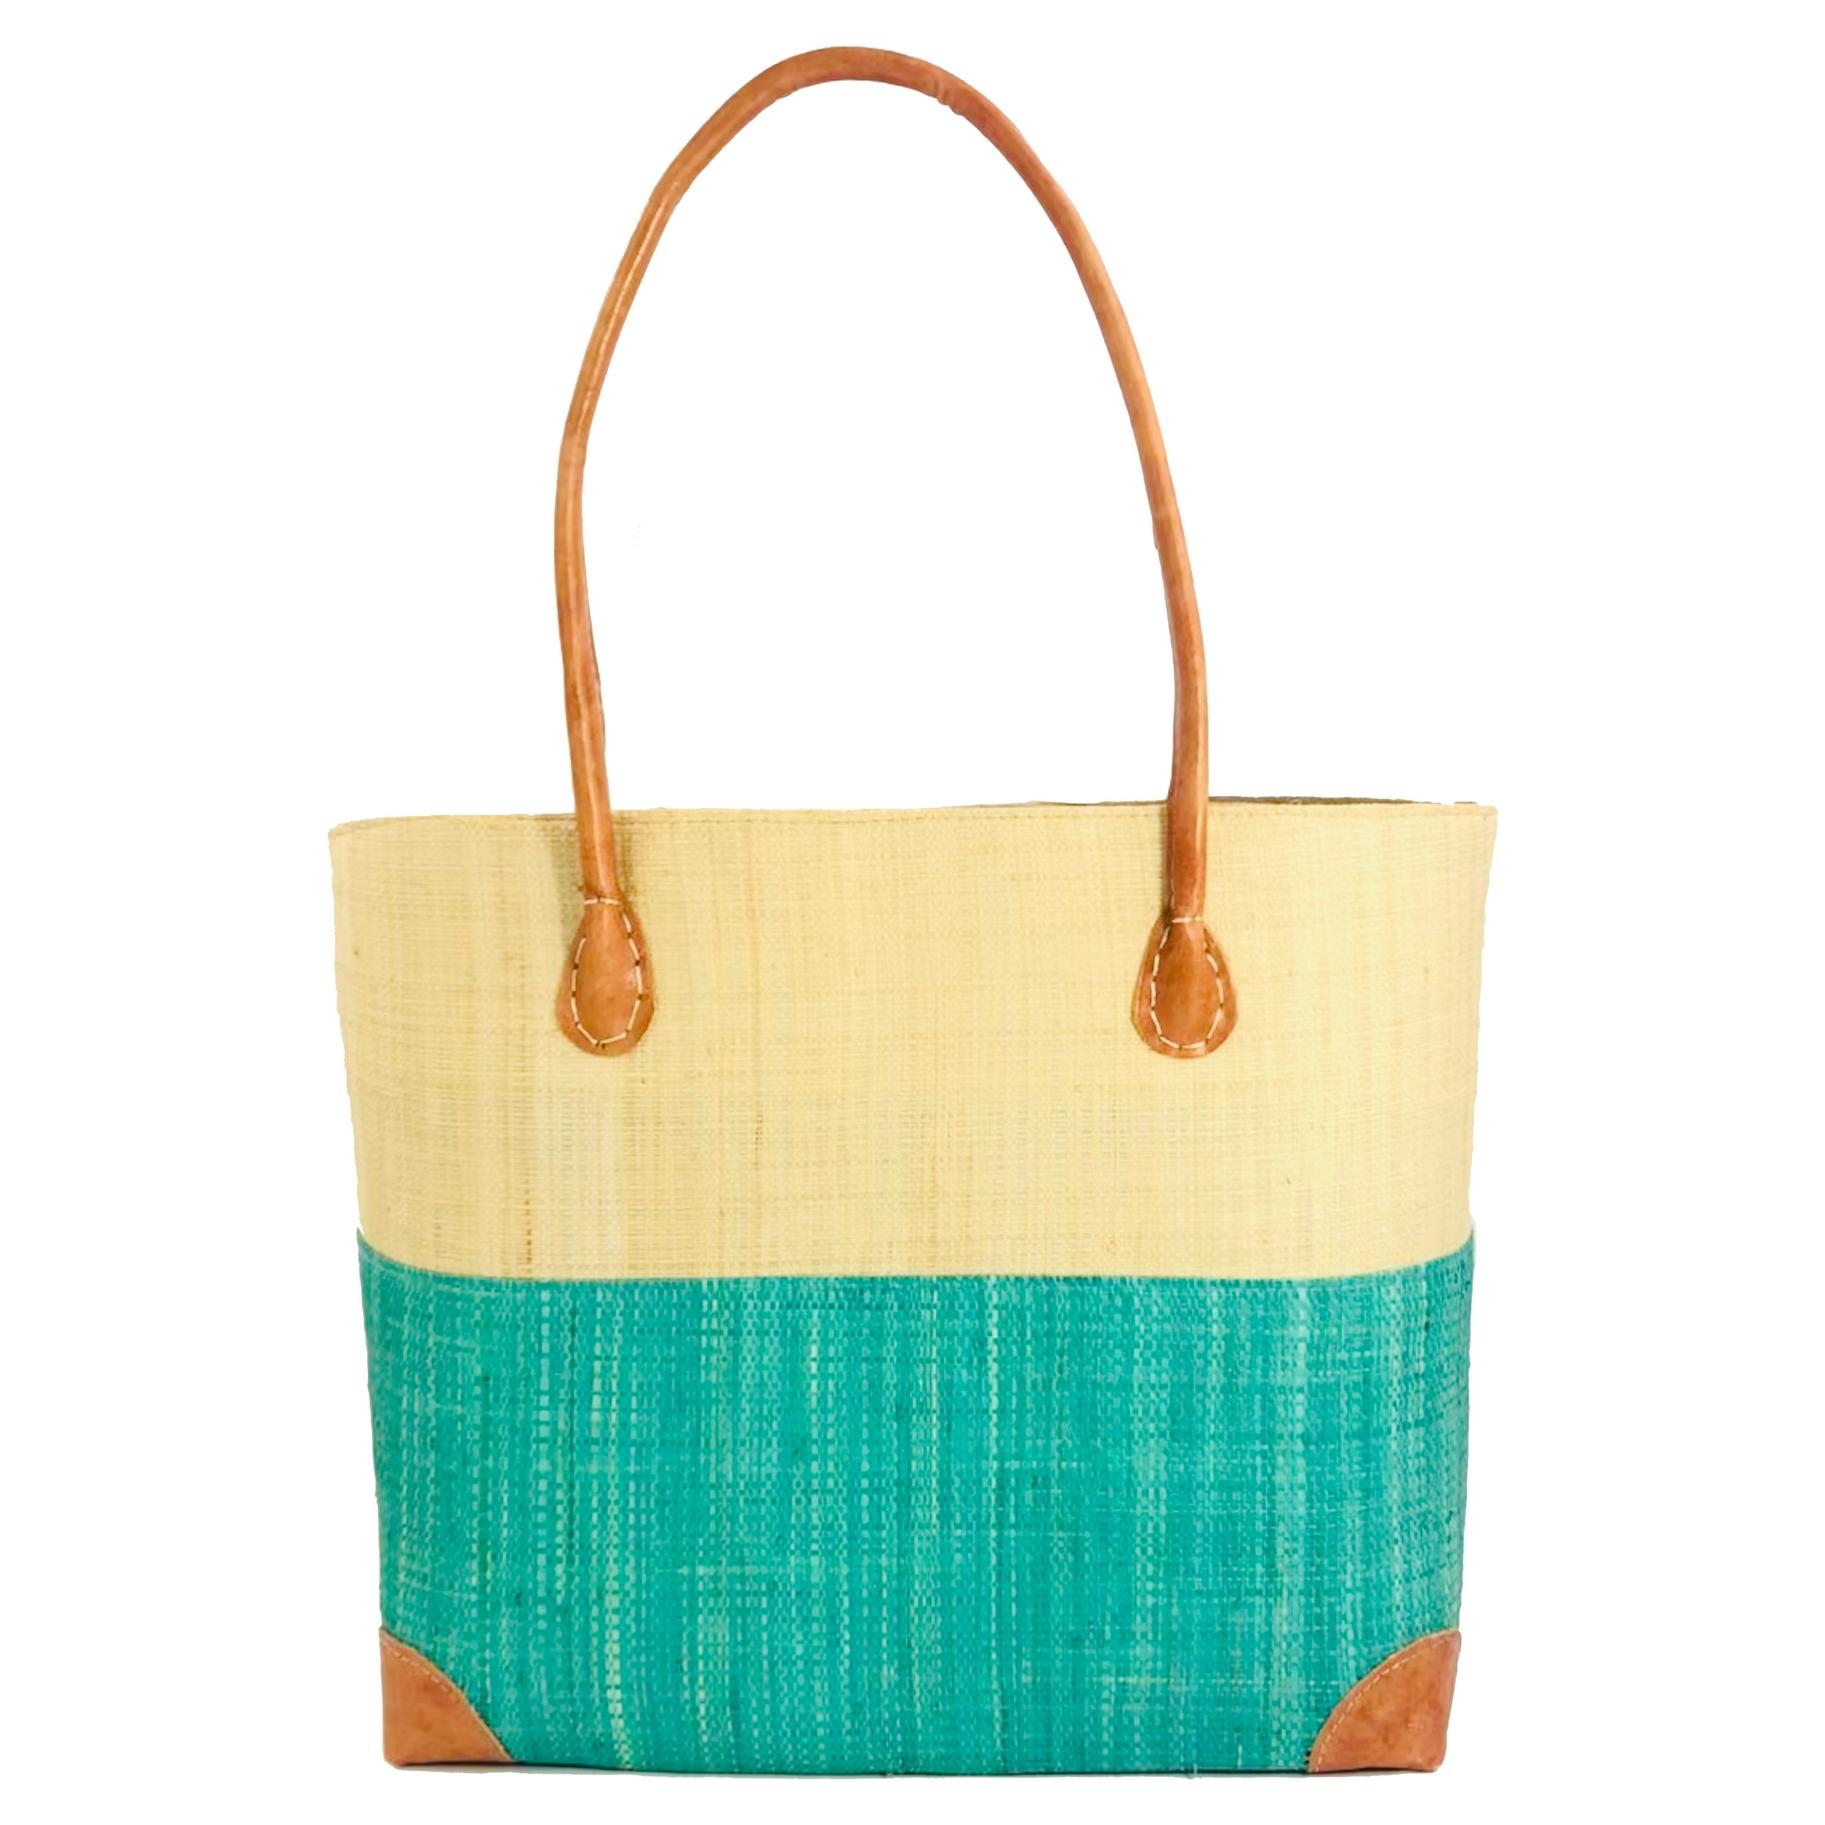 Trinidad Two Tone Straw Basket - Mint | Trada Marketplace